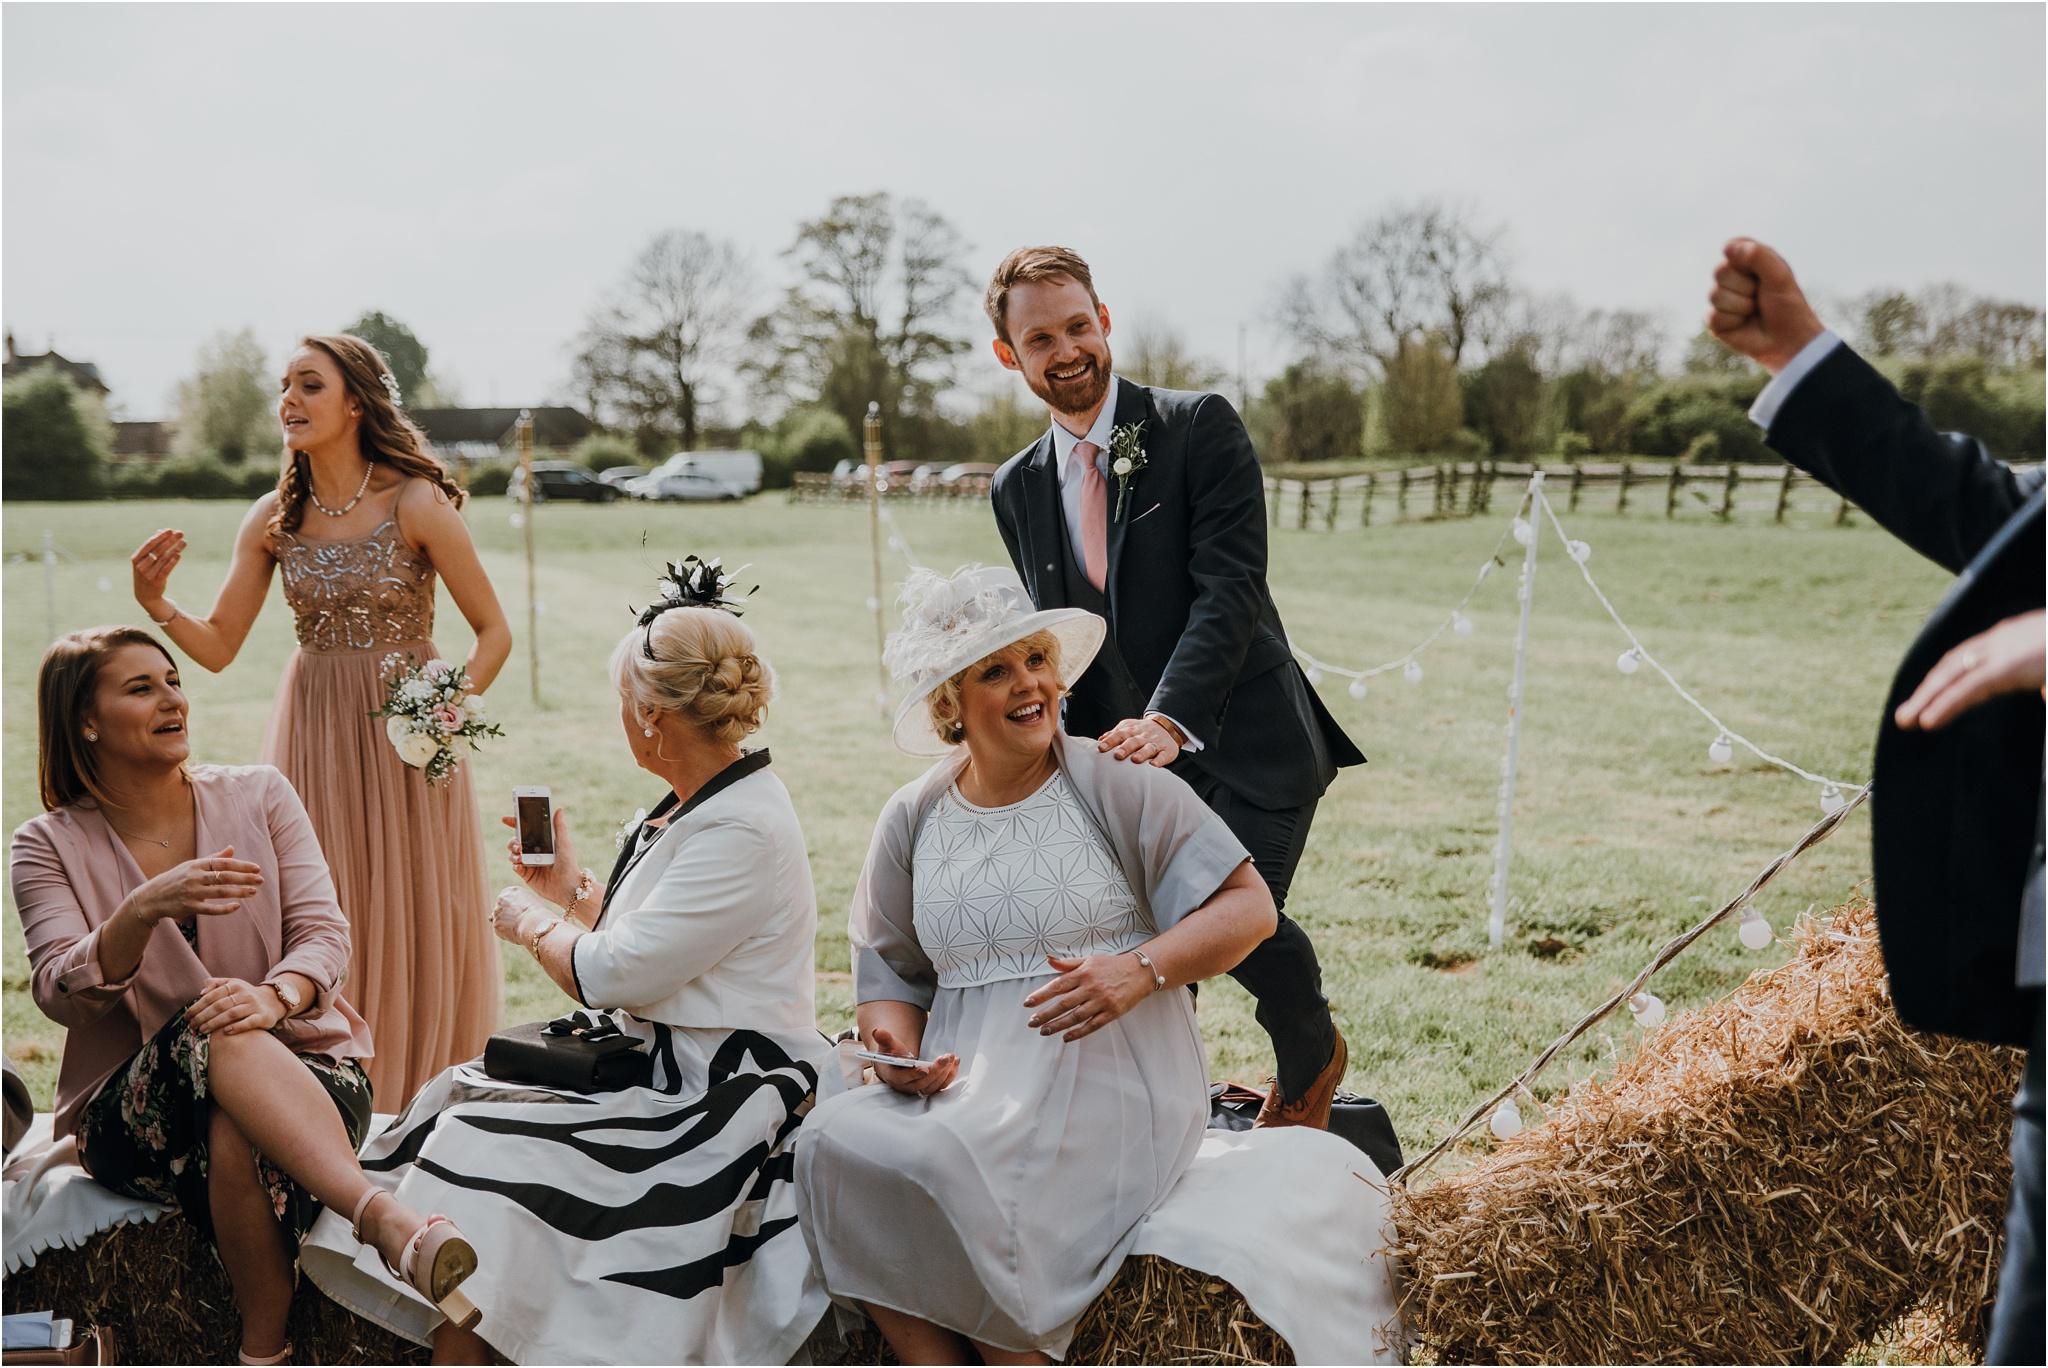 Outdoor-country-wedding-Edinburgh-photographer__0095.jpg